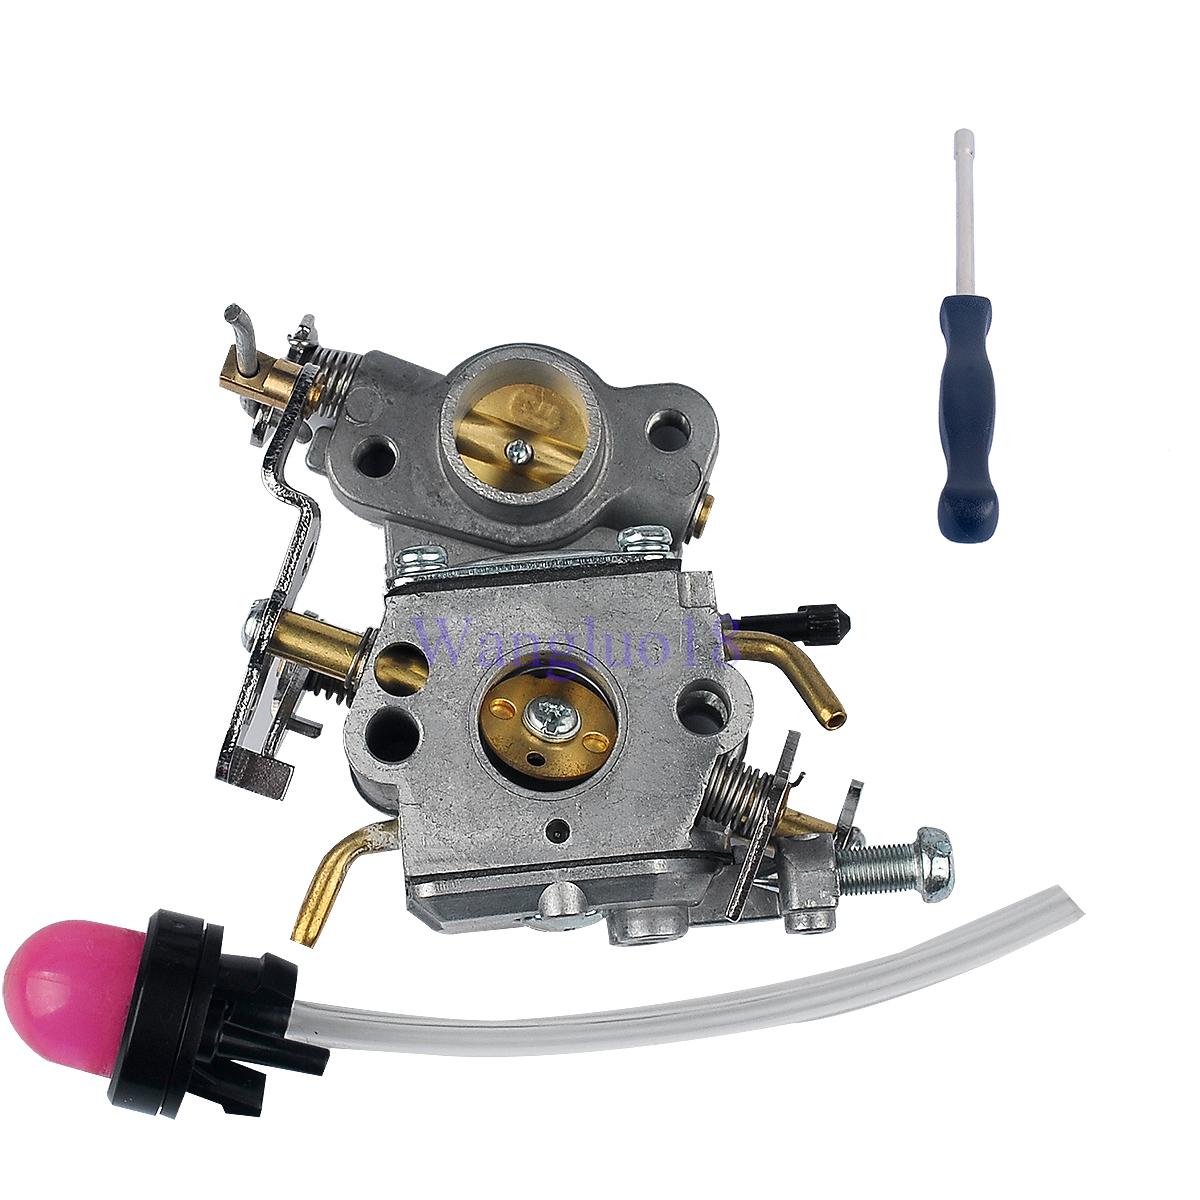 Details about For Poulan Chainsaw Carburetor 545070601 Zama c1m-w26  W/primer bulb fuel line